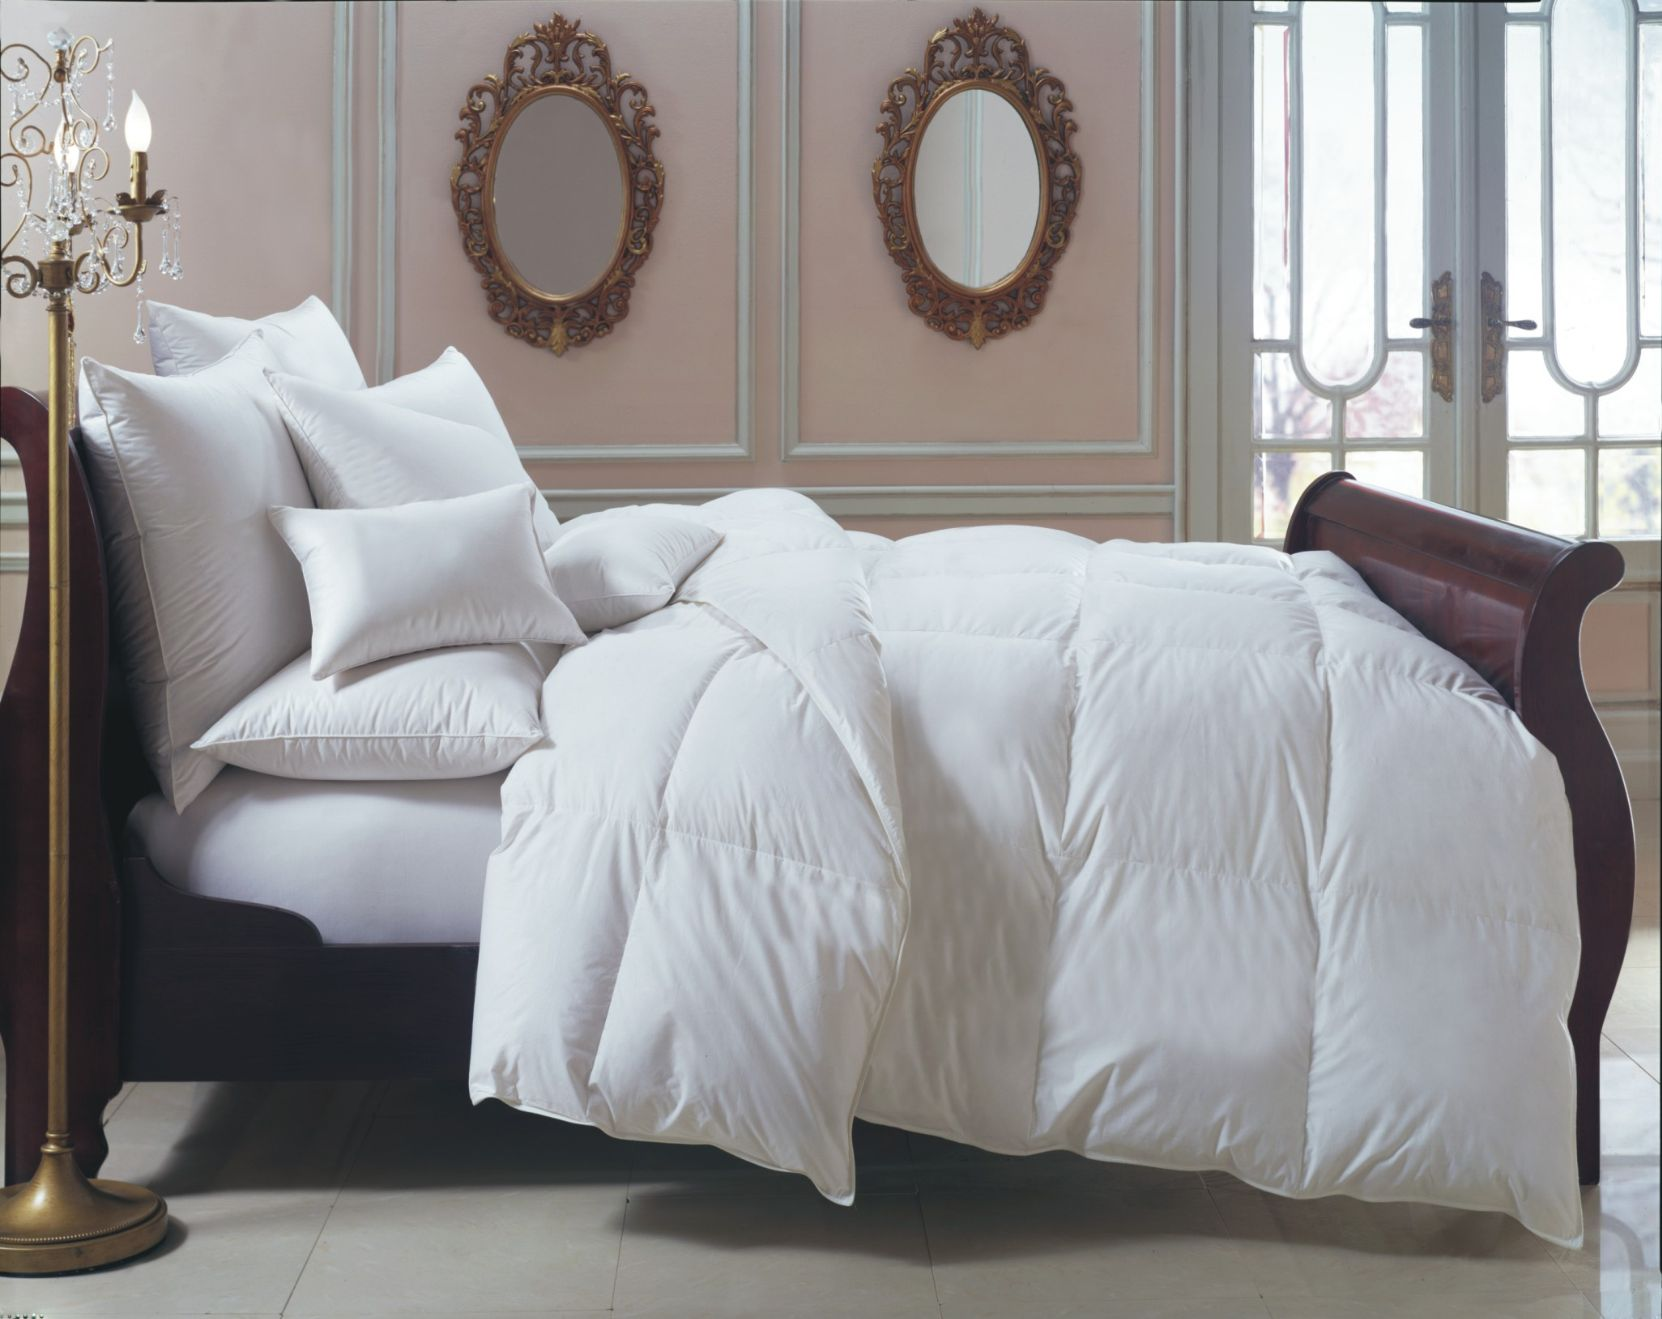 Down Comforter Review Parfums De Nicolai Sacrebleu